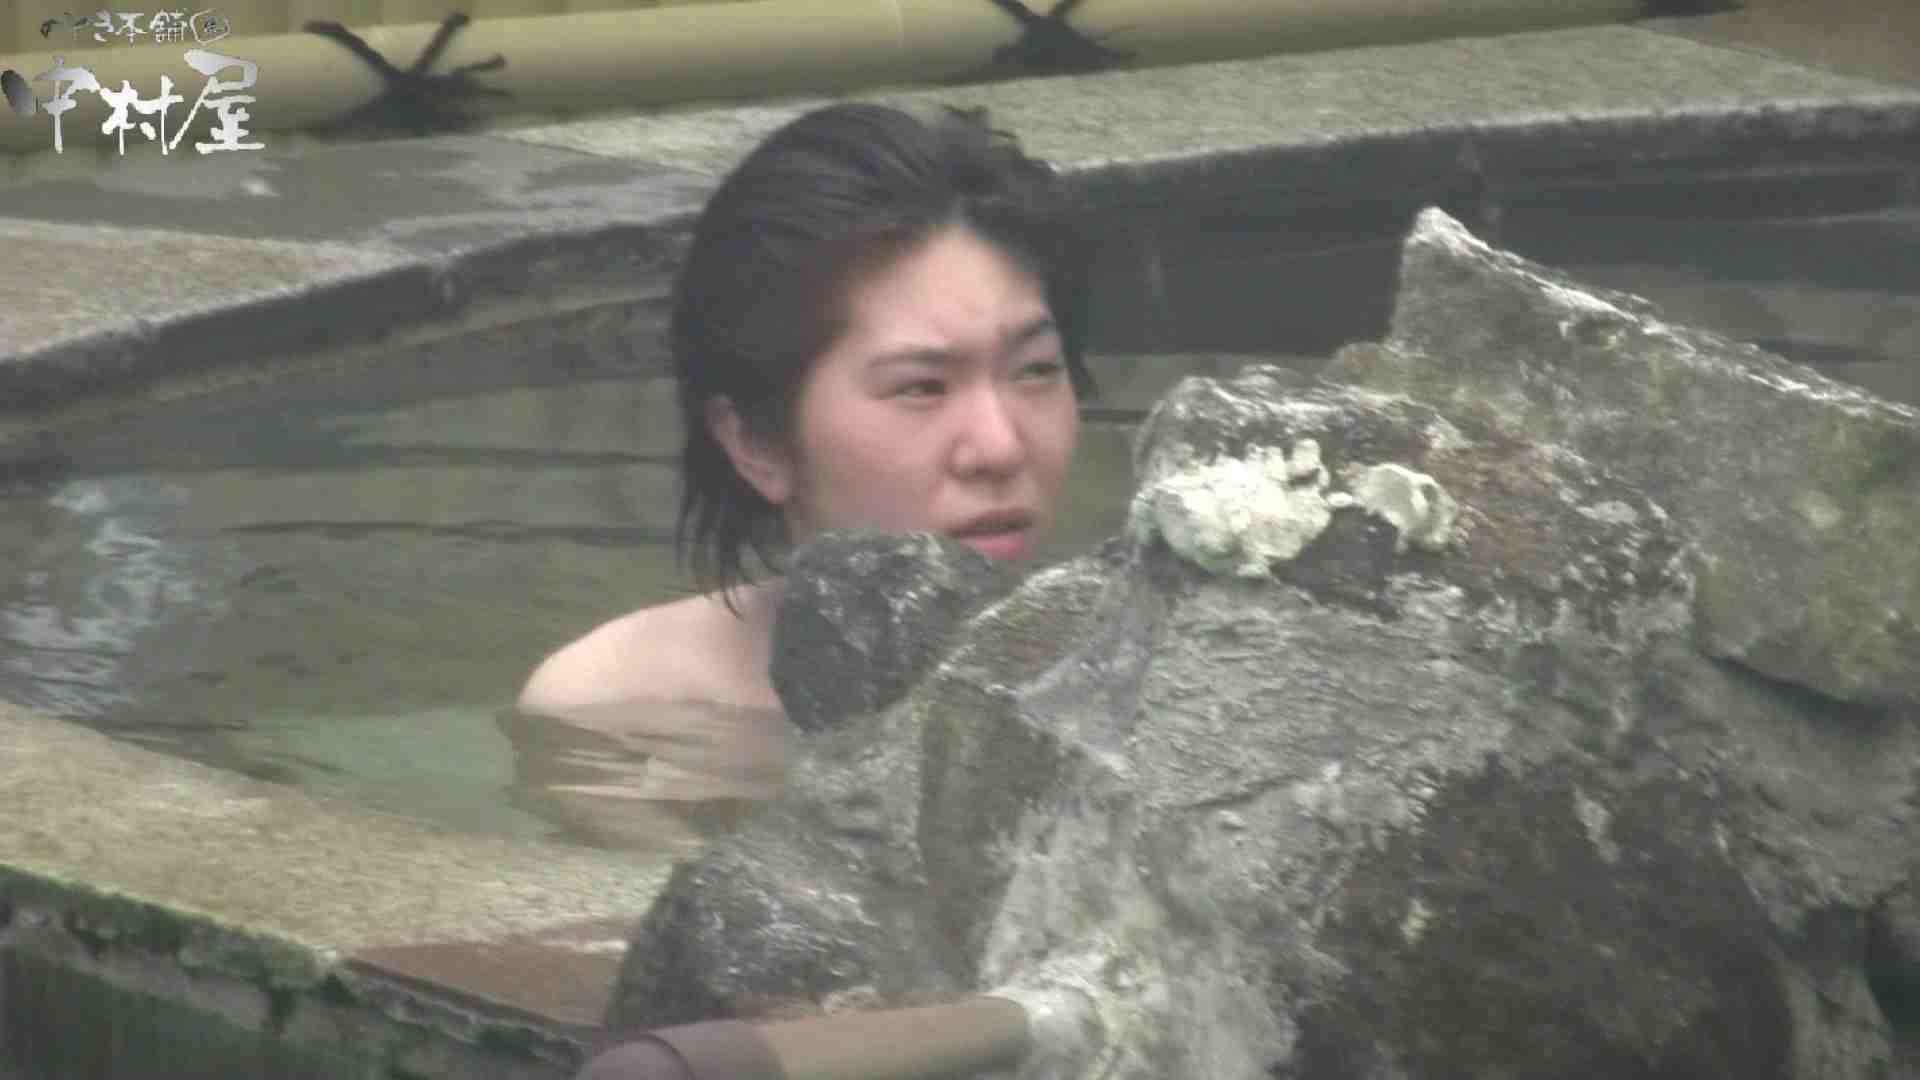 Aquaな露天風呂Vol.907 露天風呂 隠し撮りオマンコ動画紹介 62連発 23